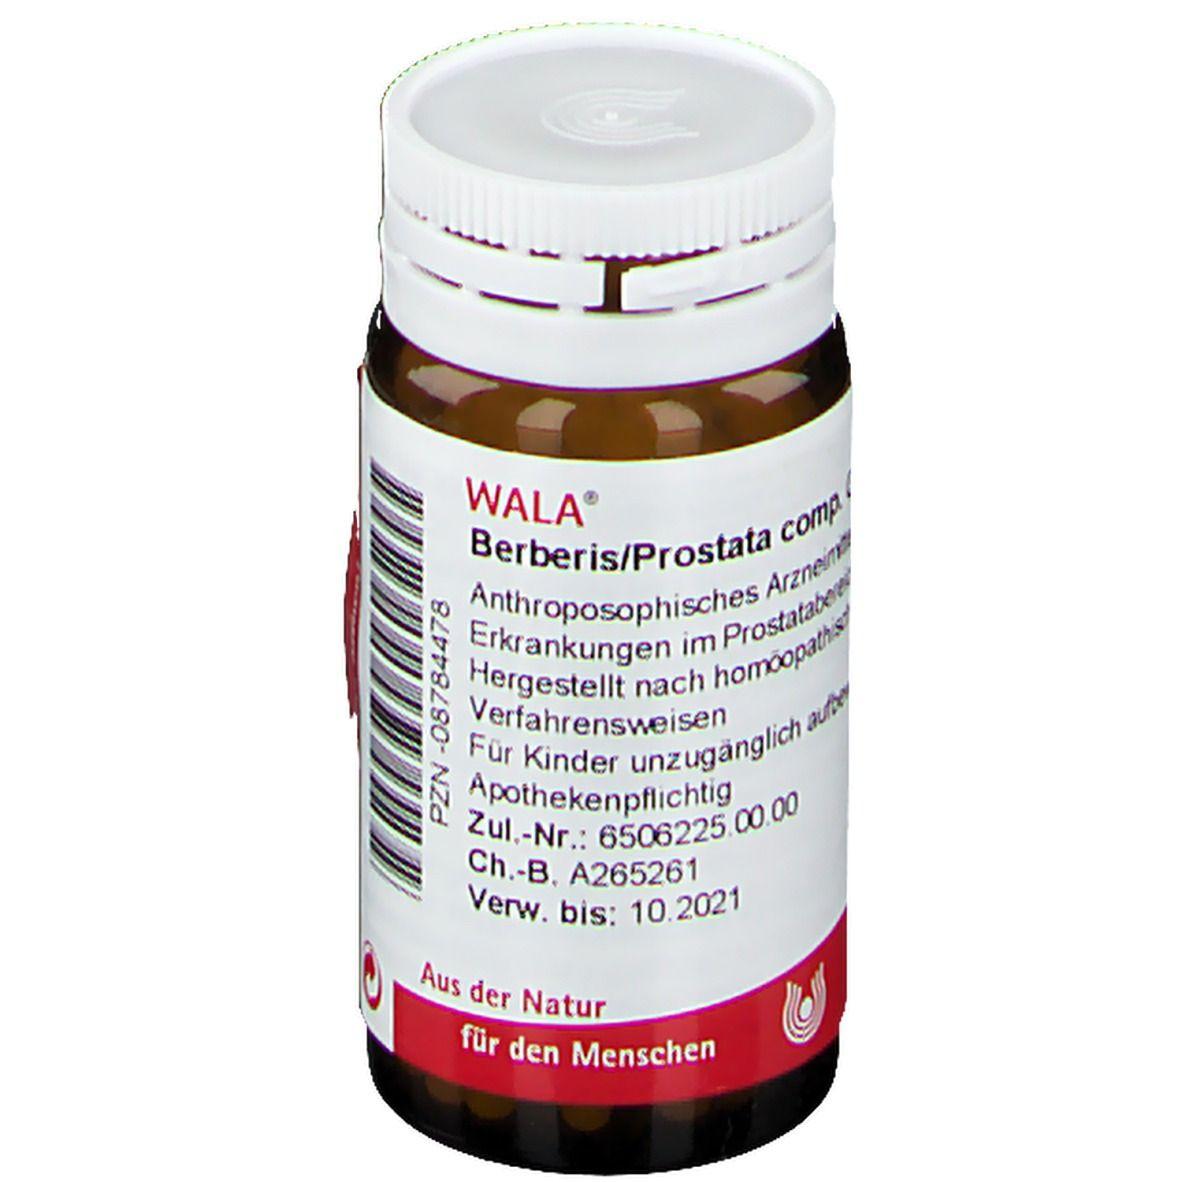 berberis prostata comp wirkung